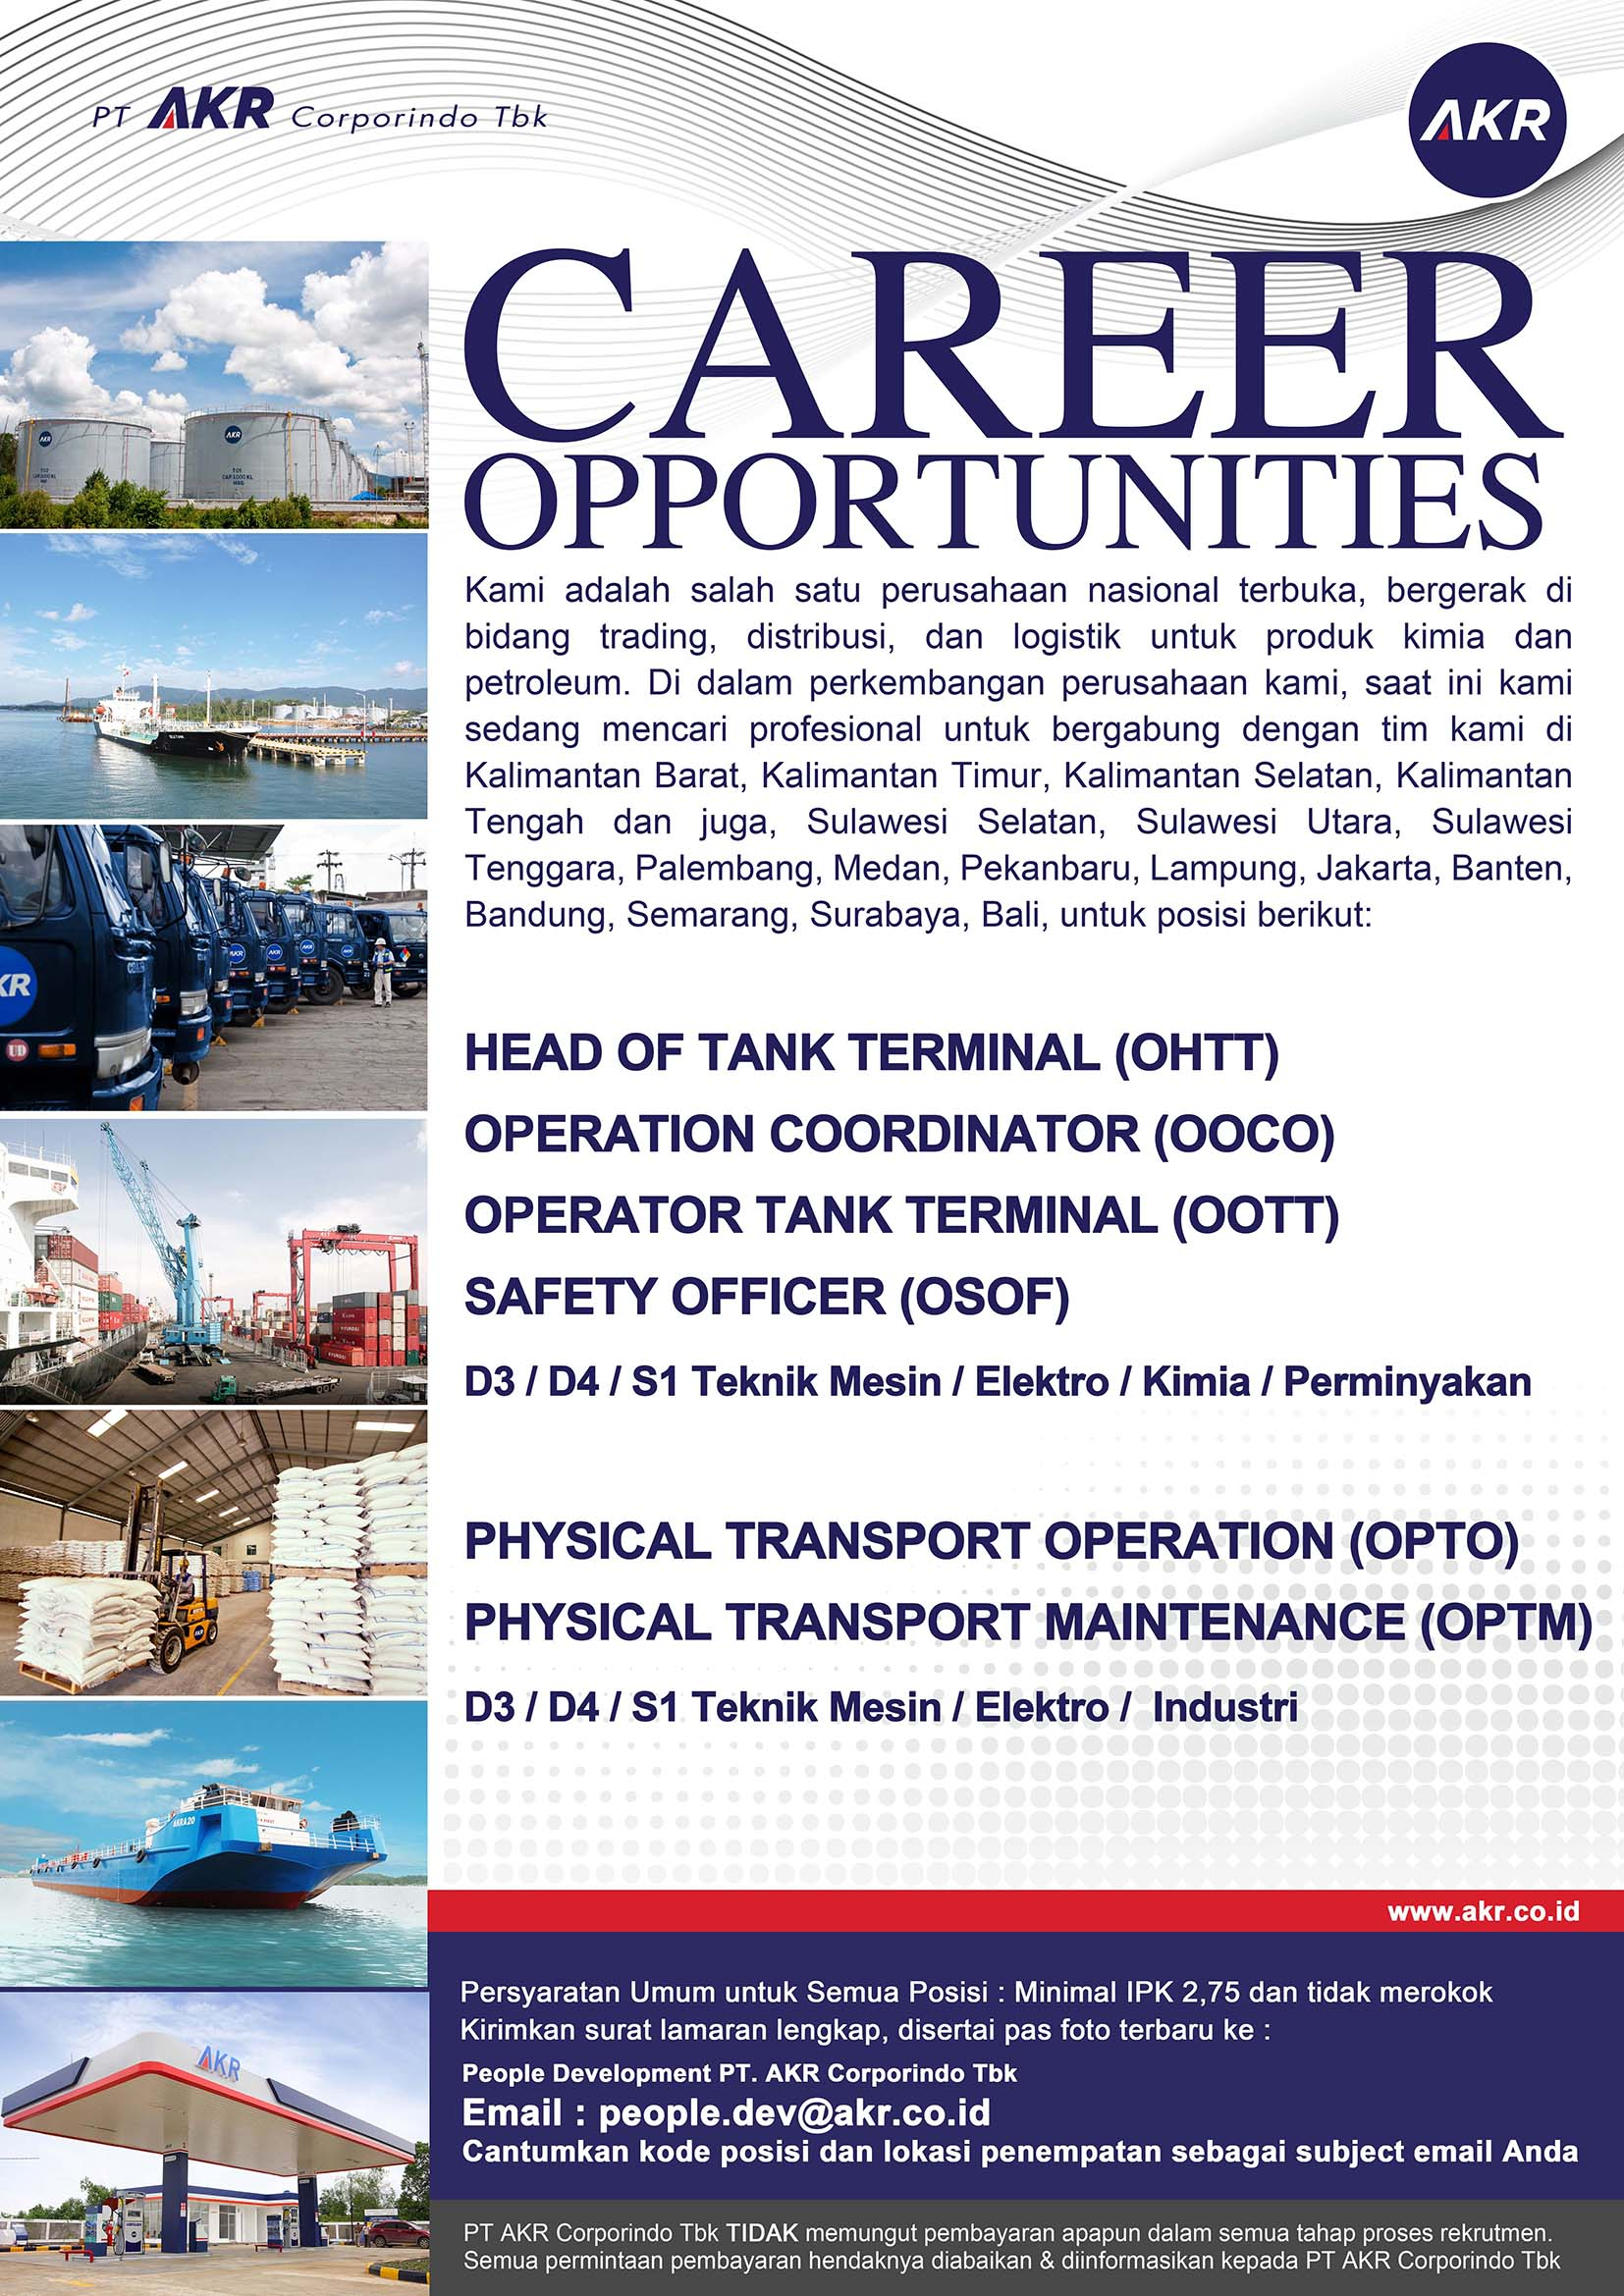 Lowongan Kerja PT AKR Corporindo Tbk Terbaru Maret 2018 ...